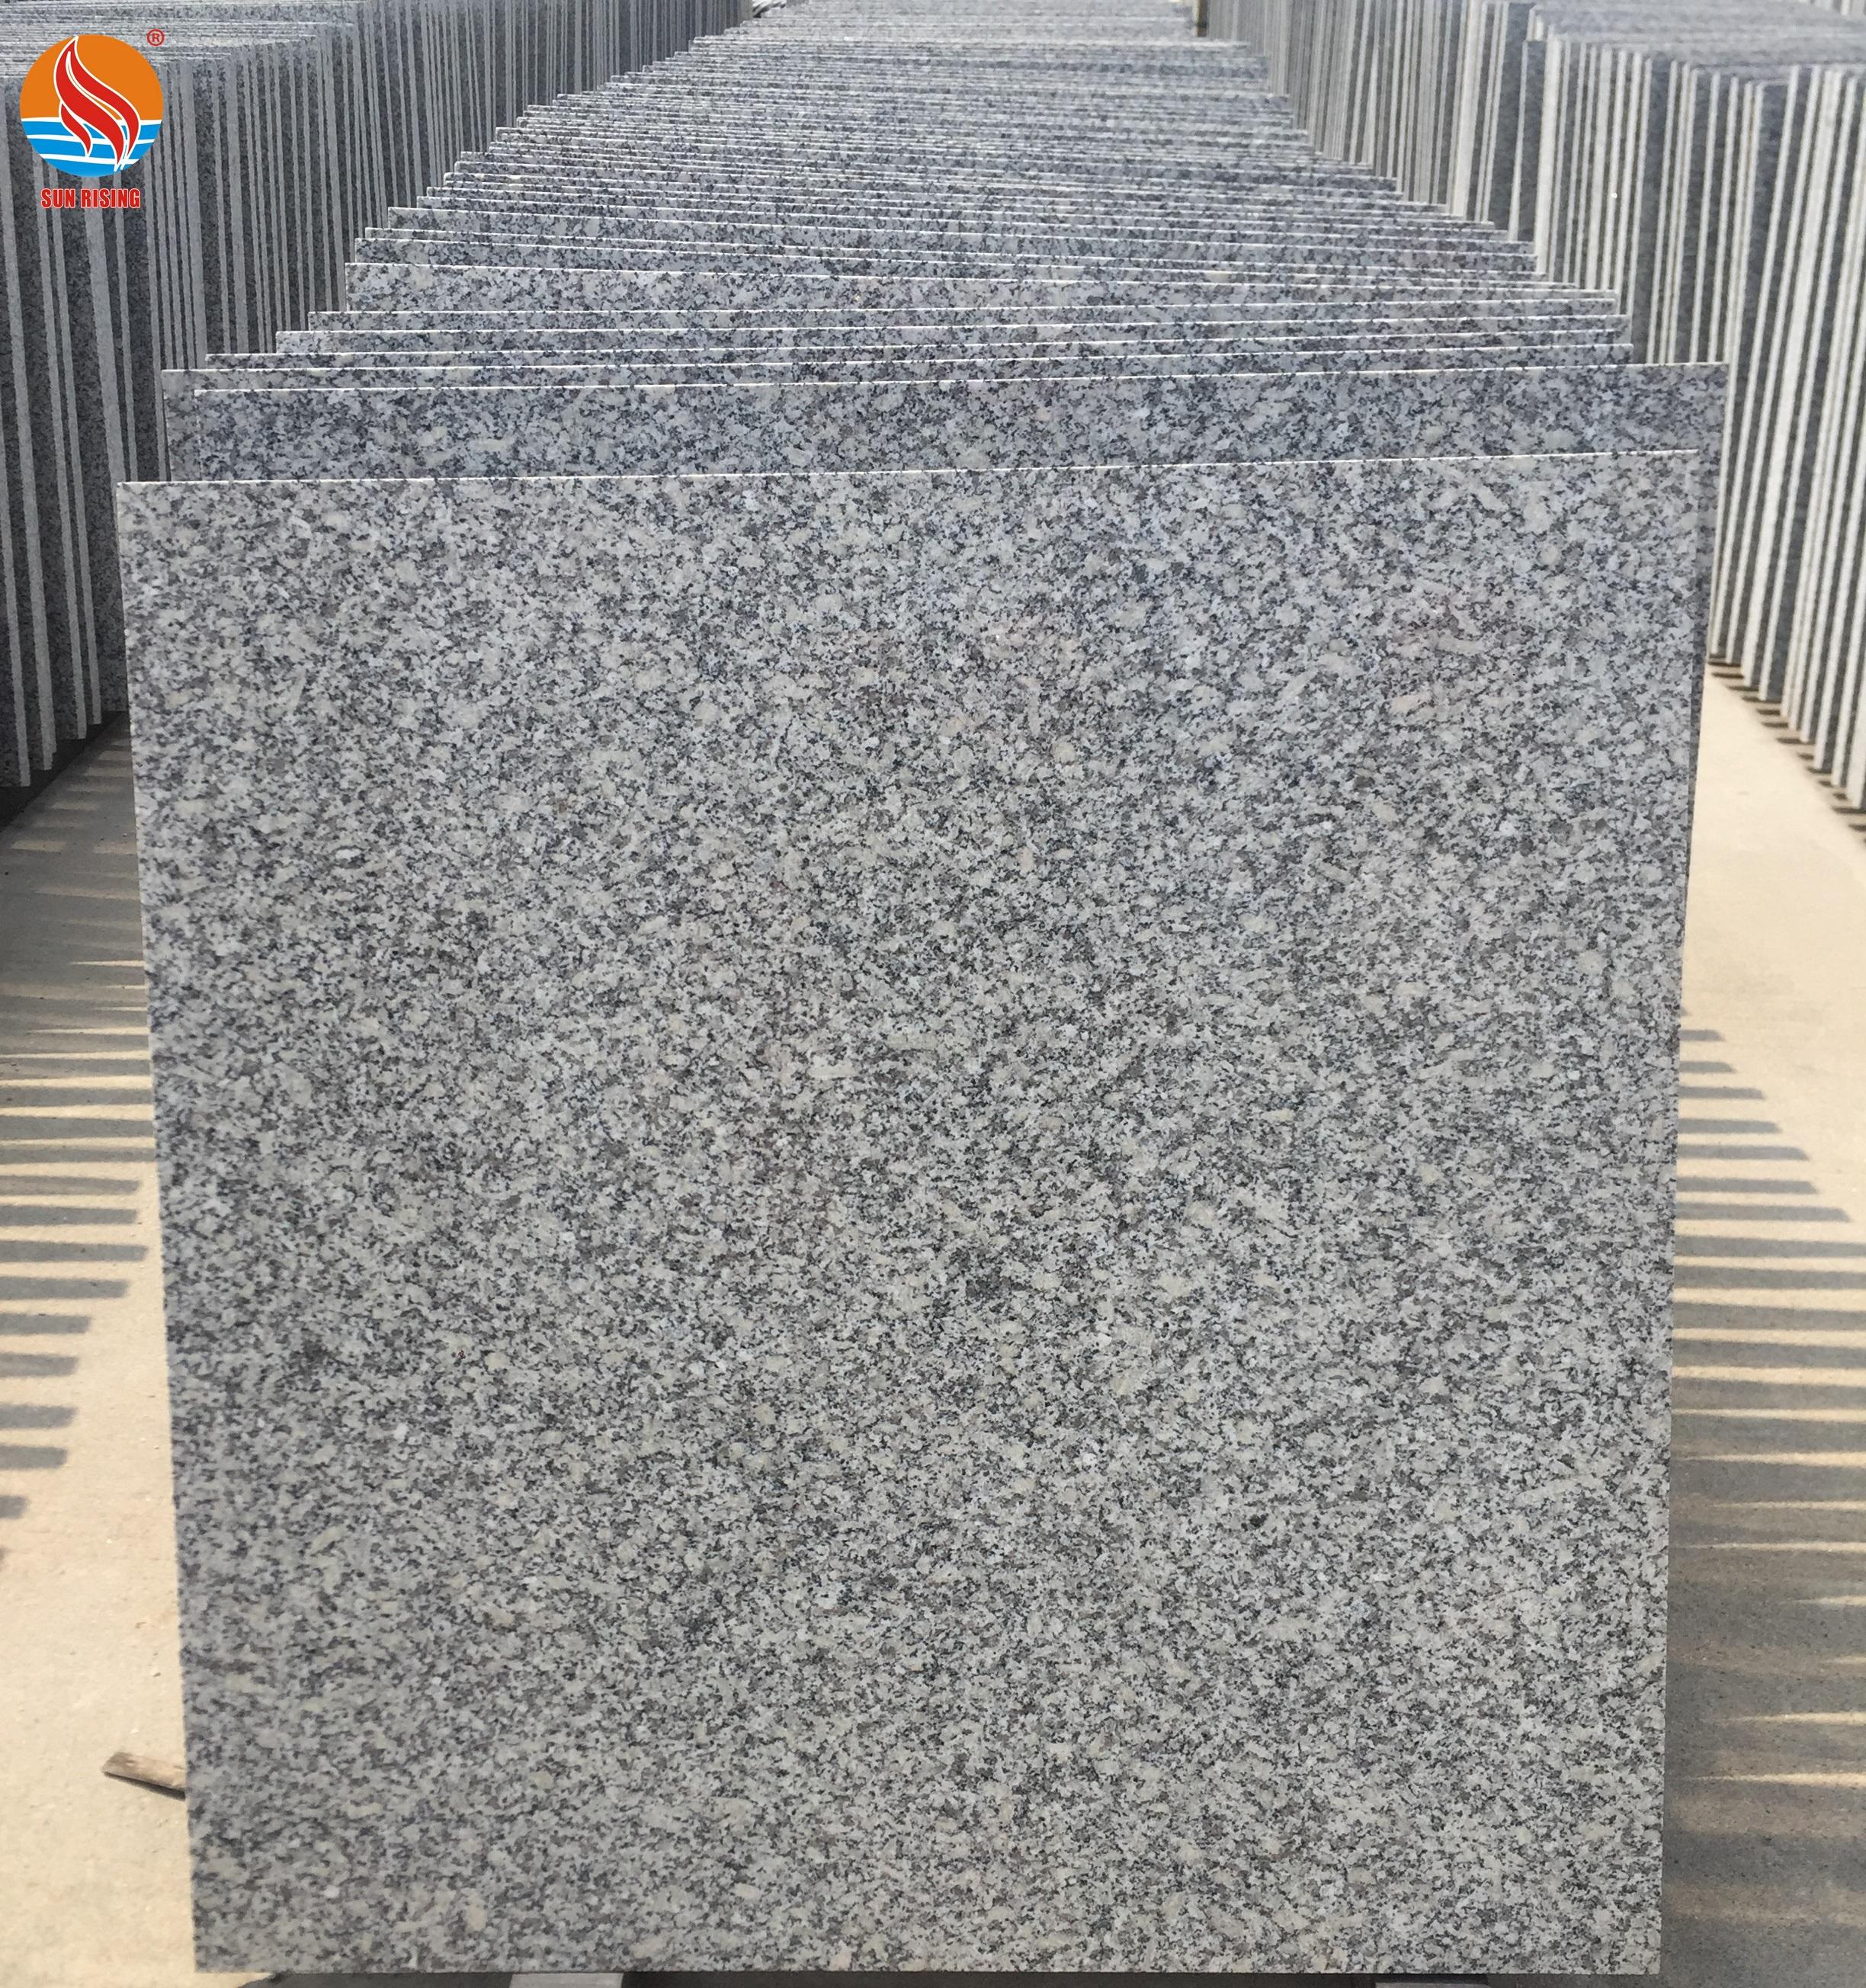 Grey Granite Stone Tiles G602